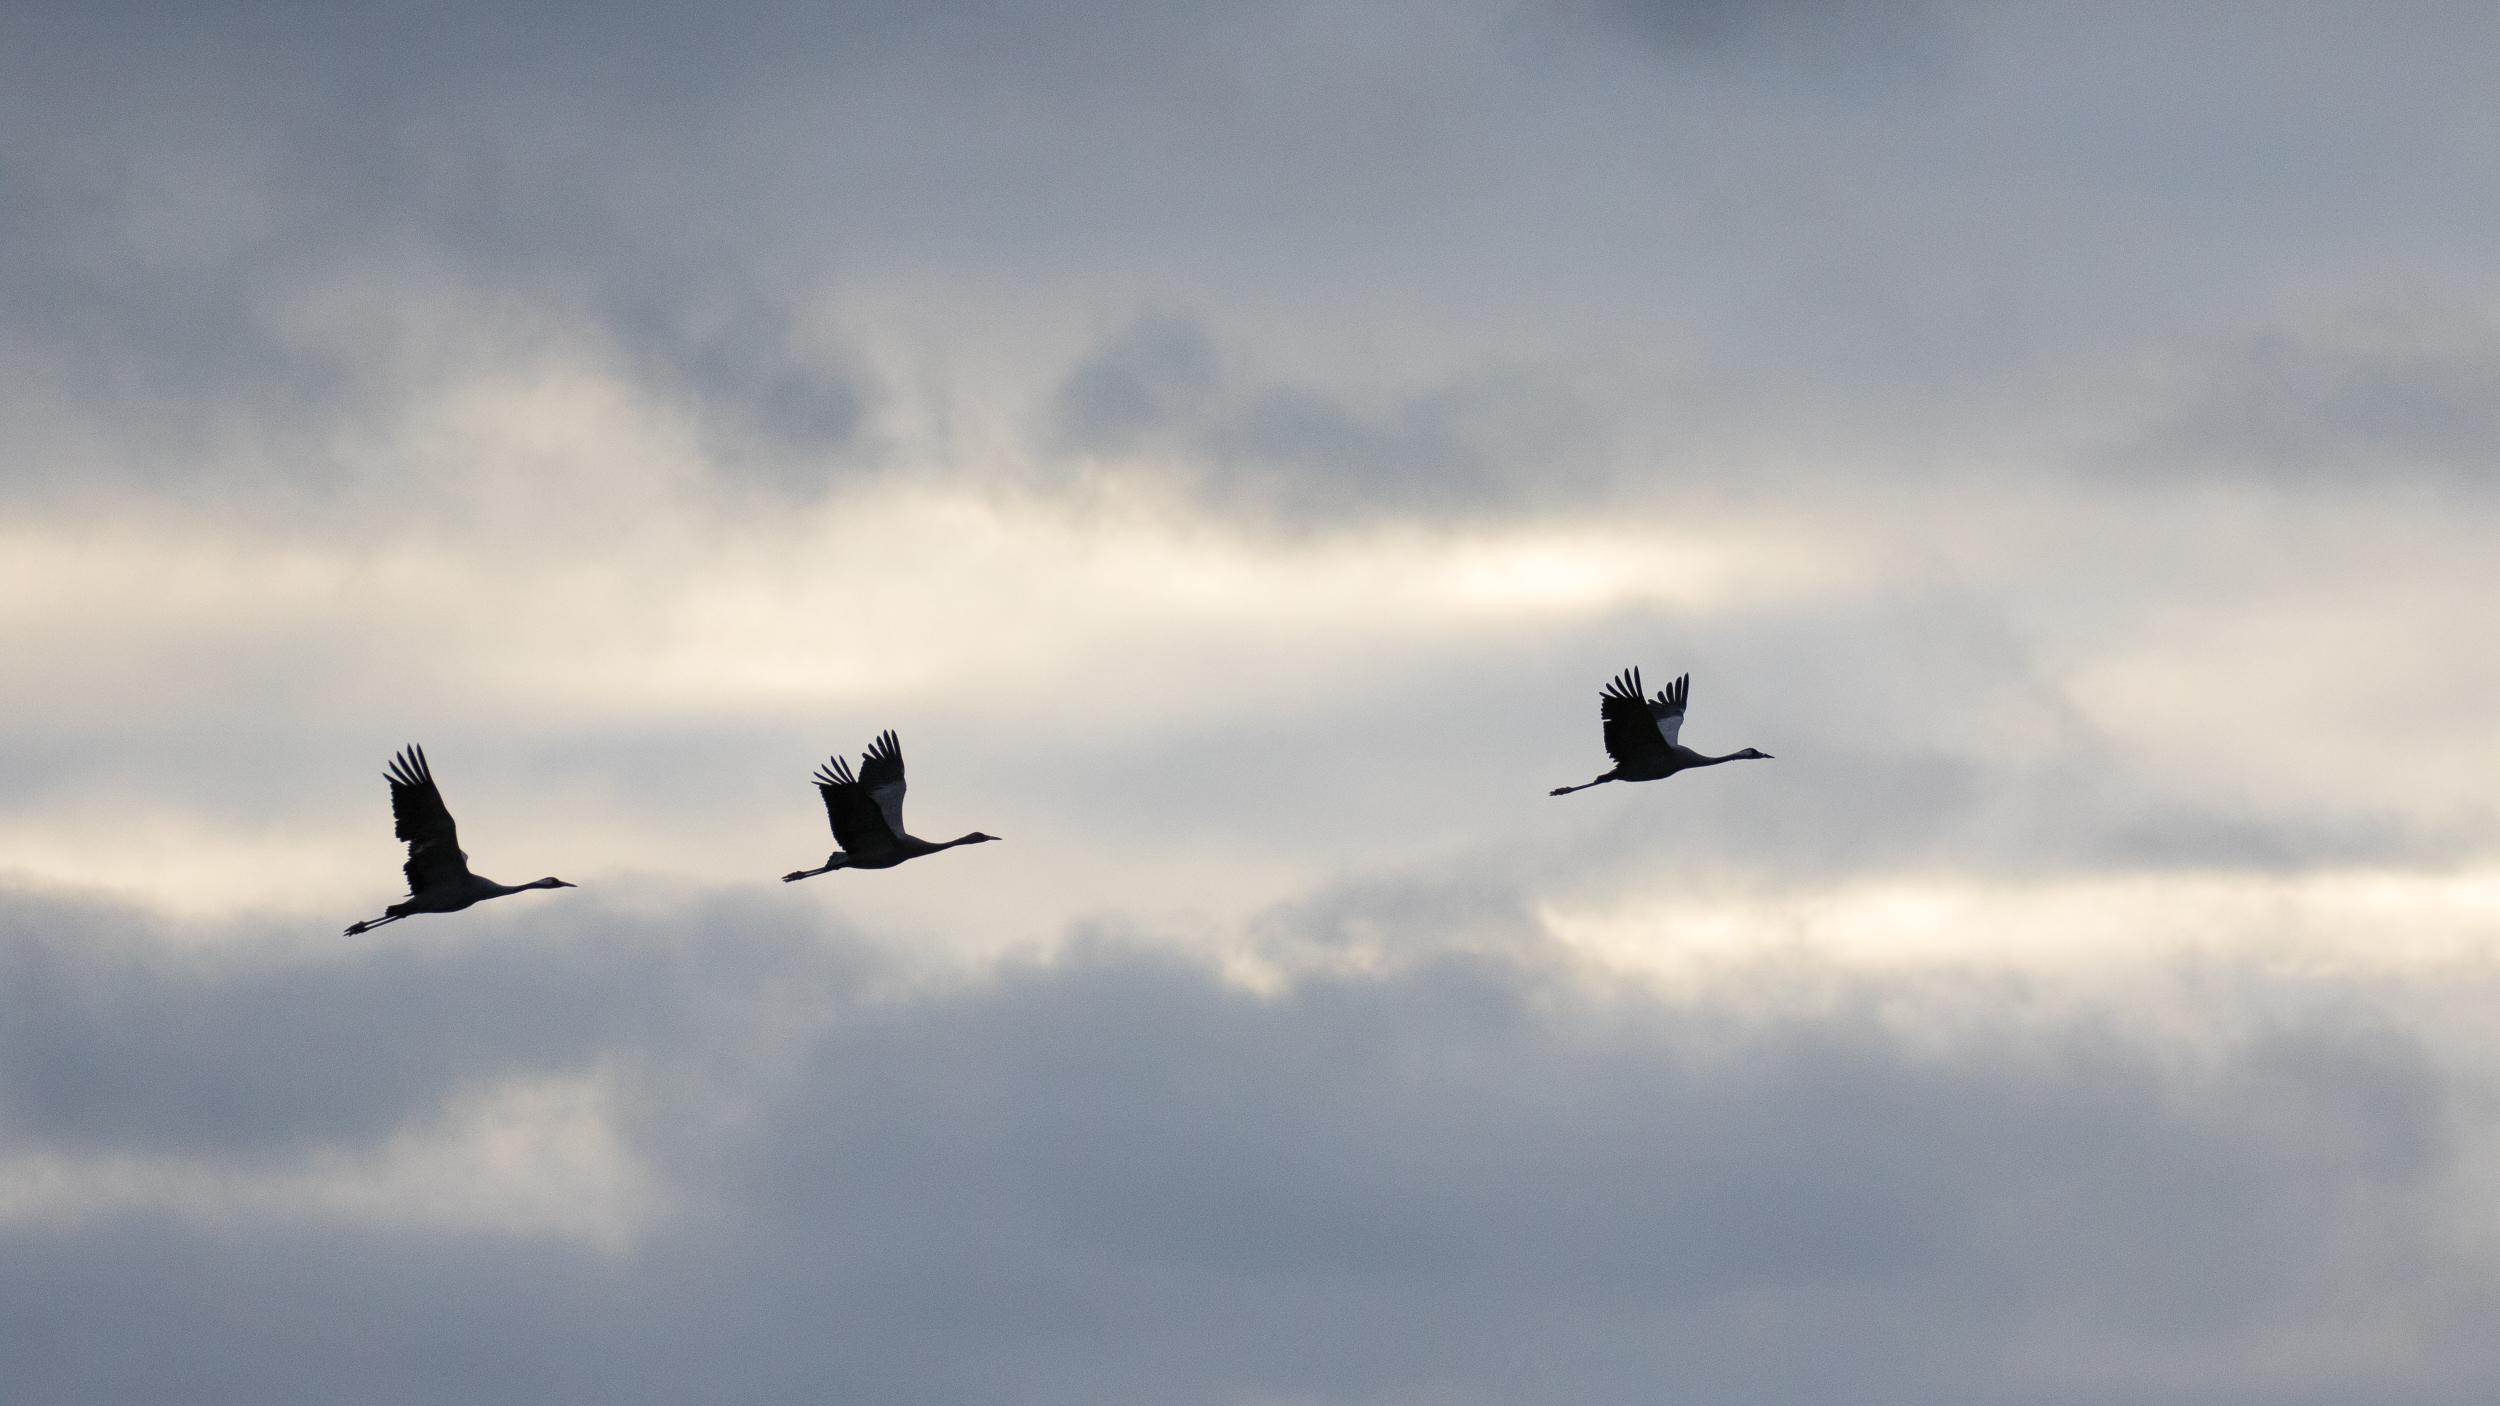 common-cranes-lake-der-chantecoq-france